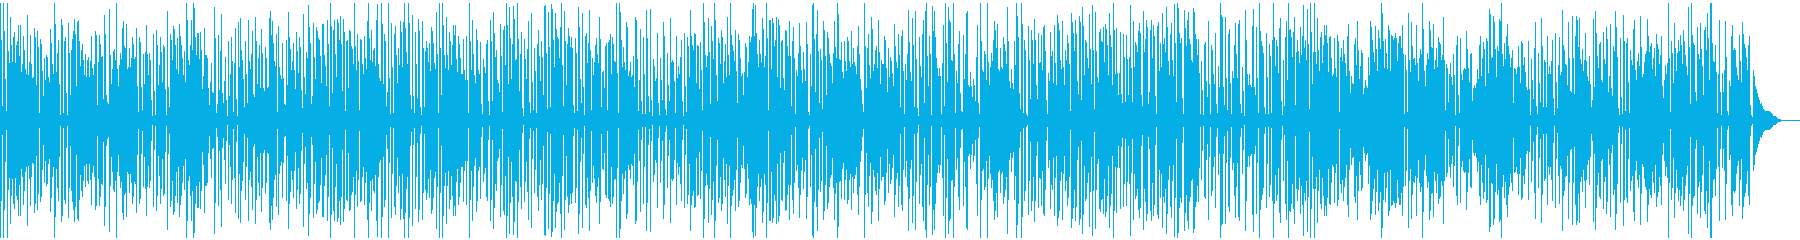 YouTube、カフェ、ジャズピアノの再生済みの波形